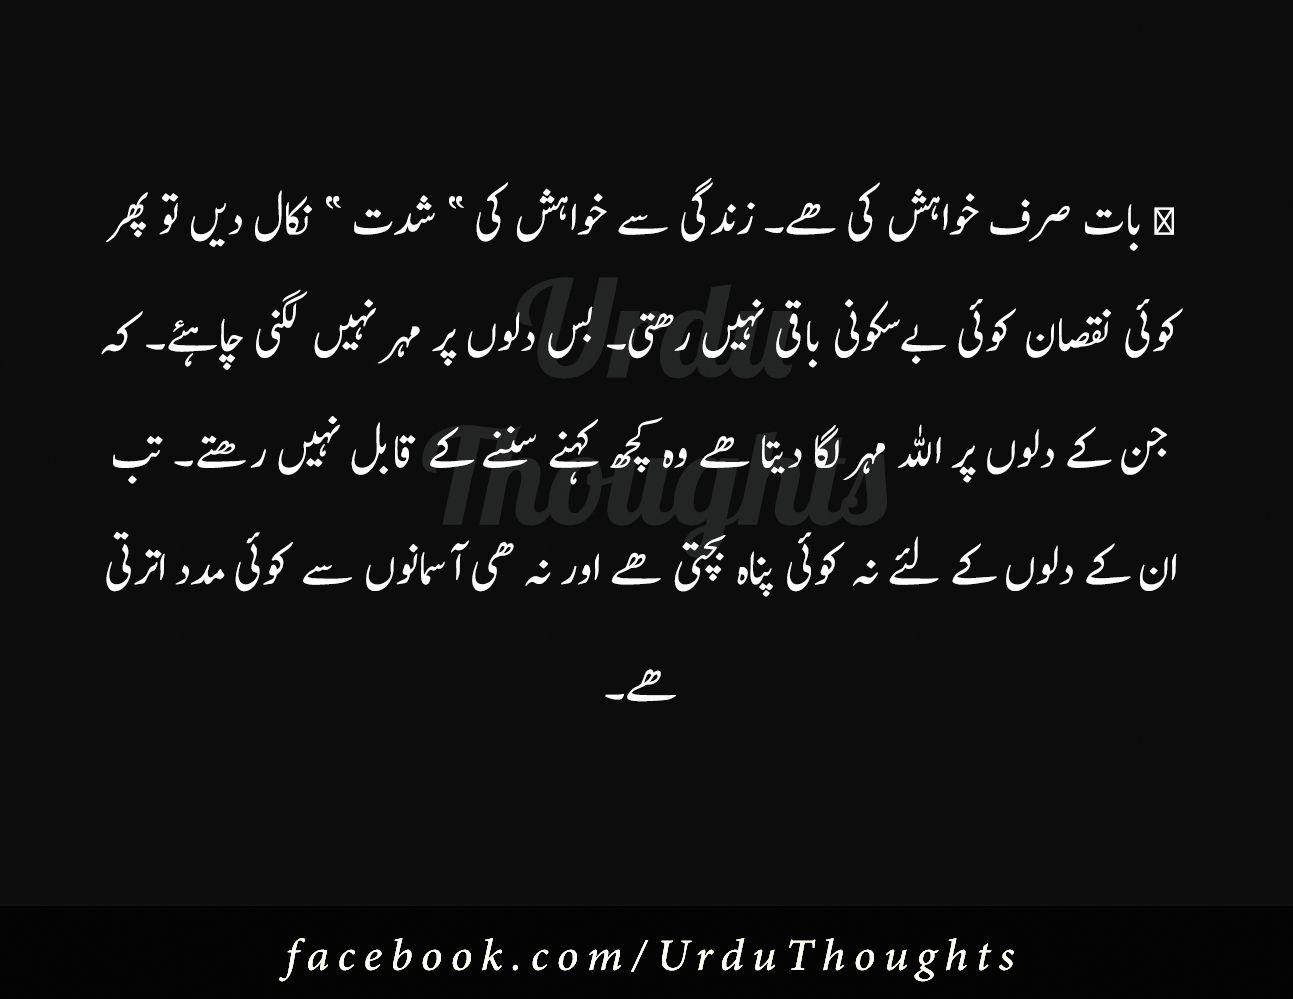 Urdu Thoughts - Best urdu quotes black Background images  Urdu